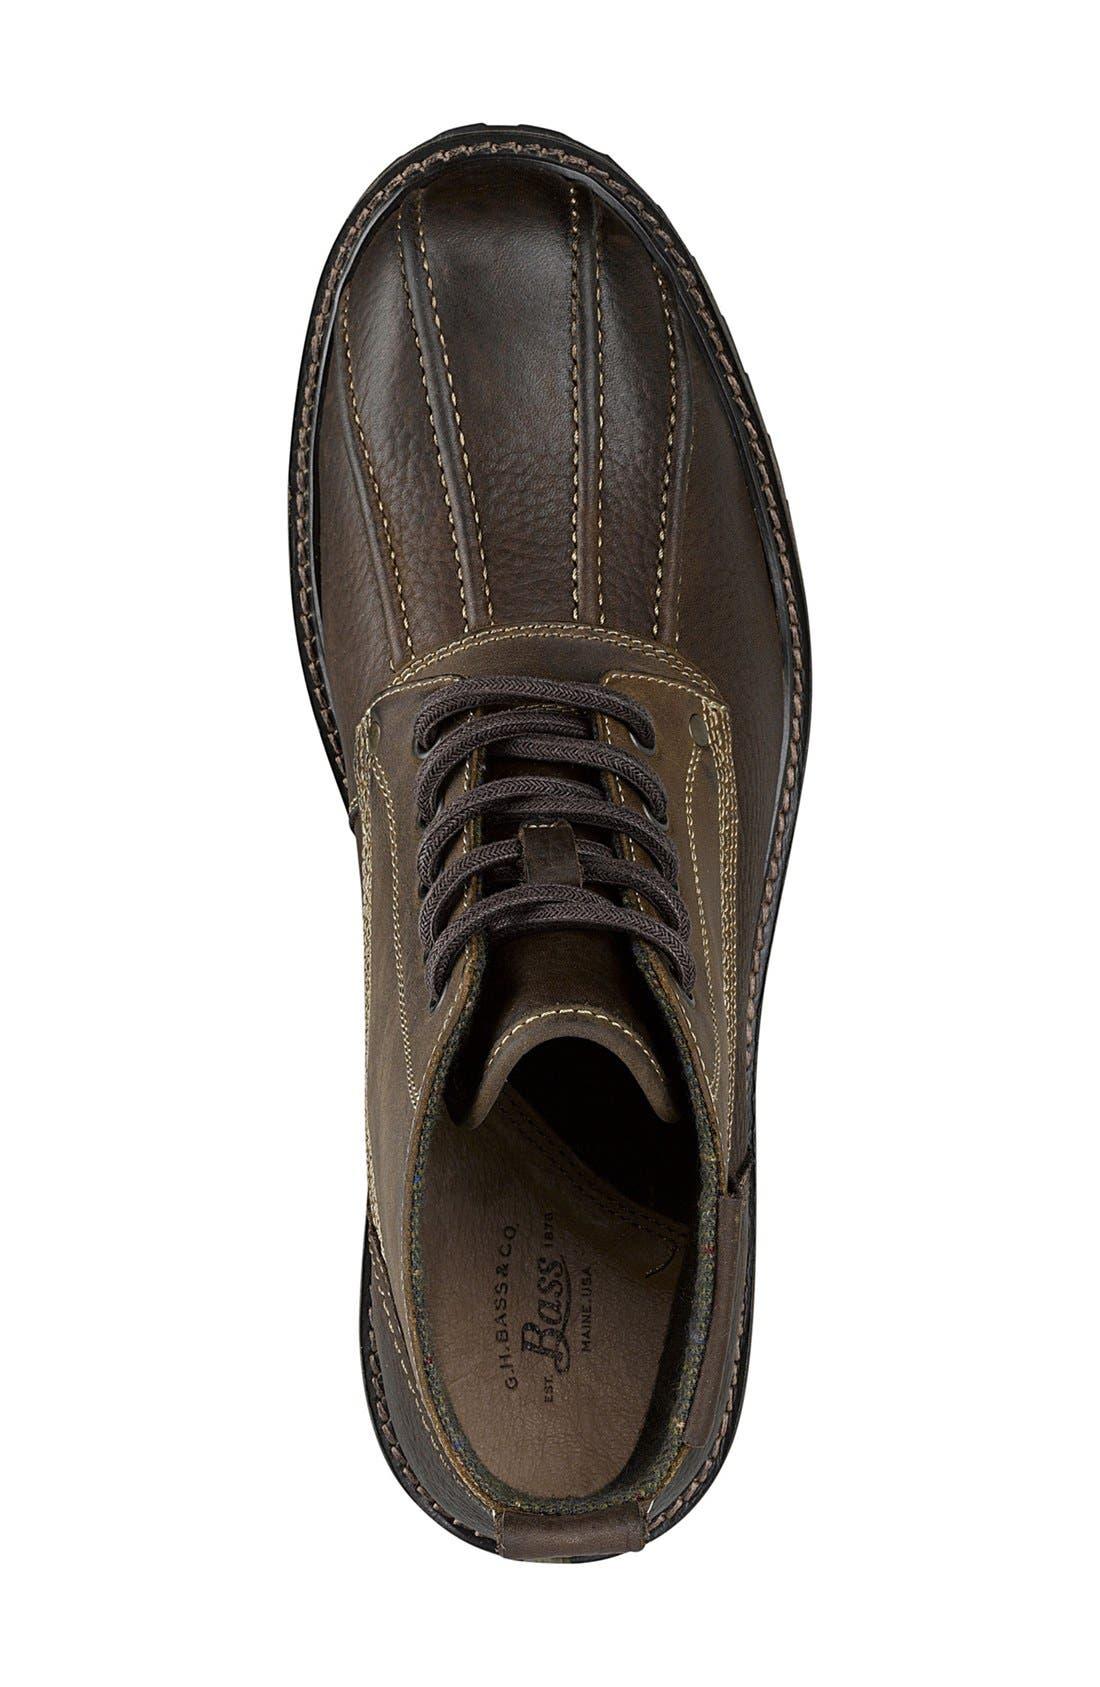 Alternate Image 3  - G.H. Bass & Co. 'Brigg' Plain Toe Boot (Men)